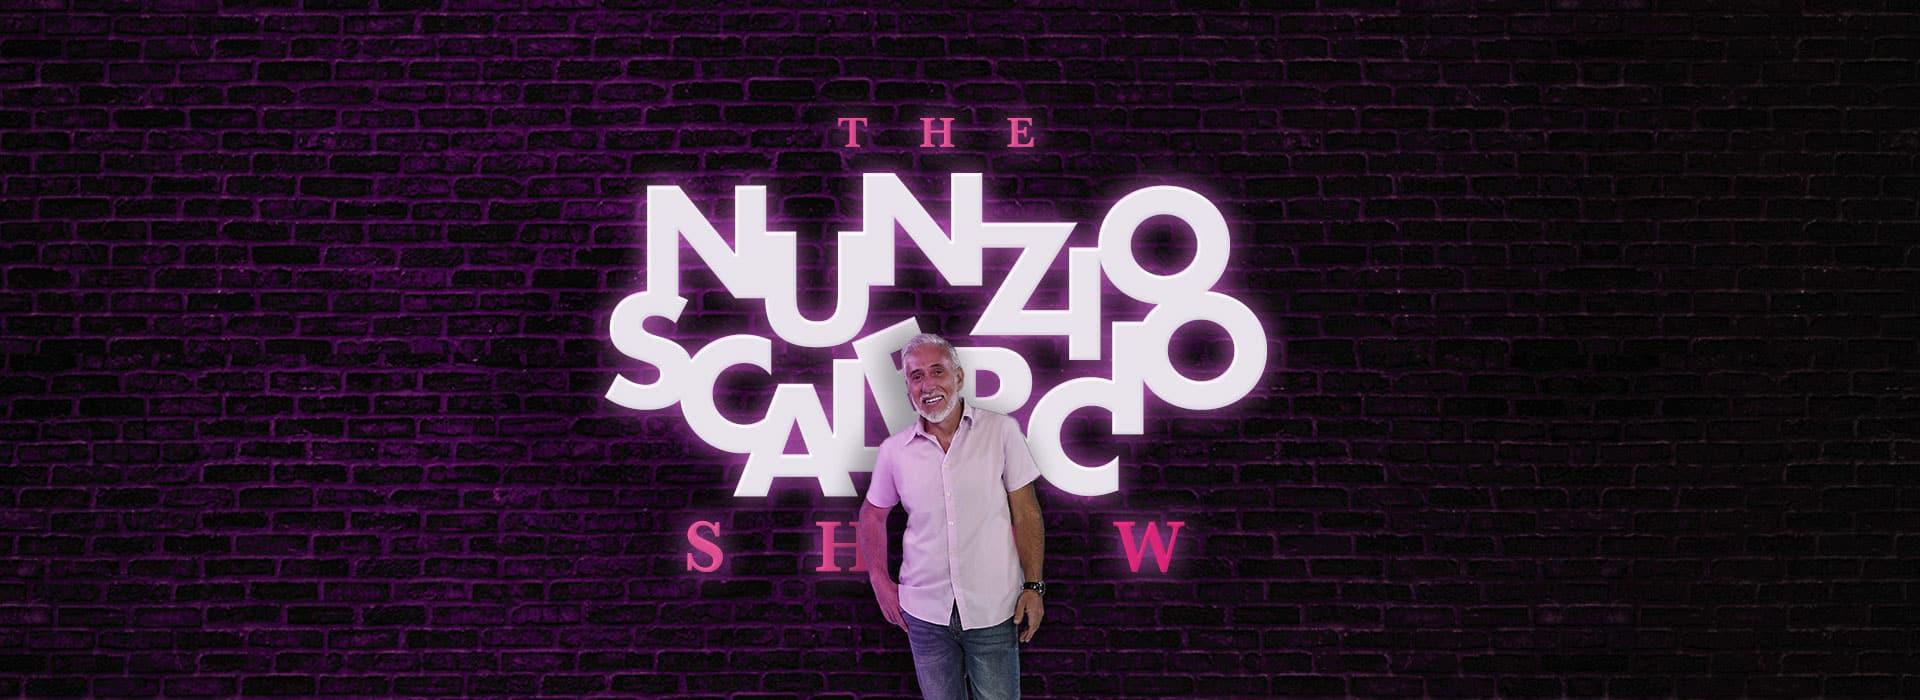 Nunzio Scalercio Show